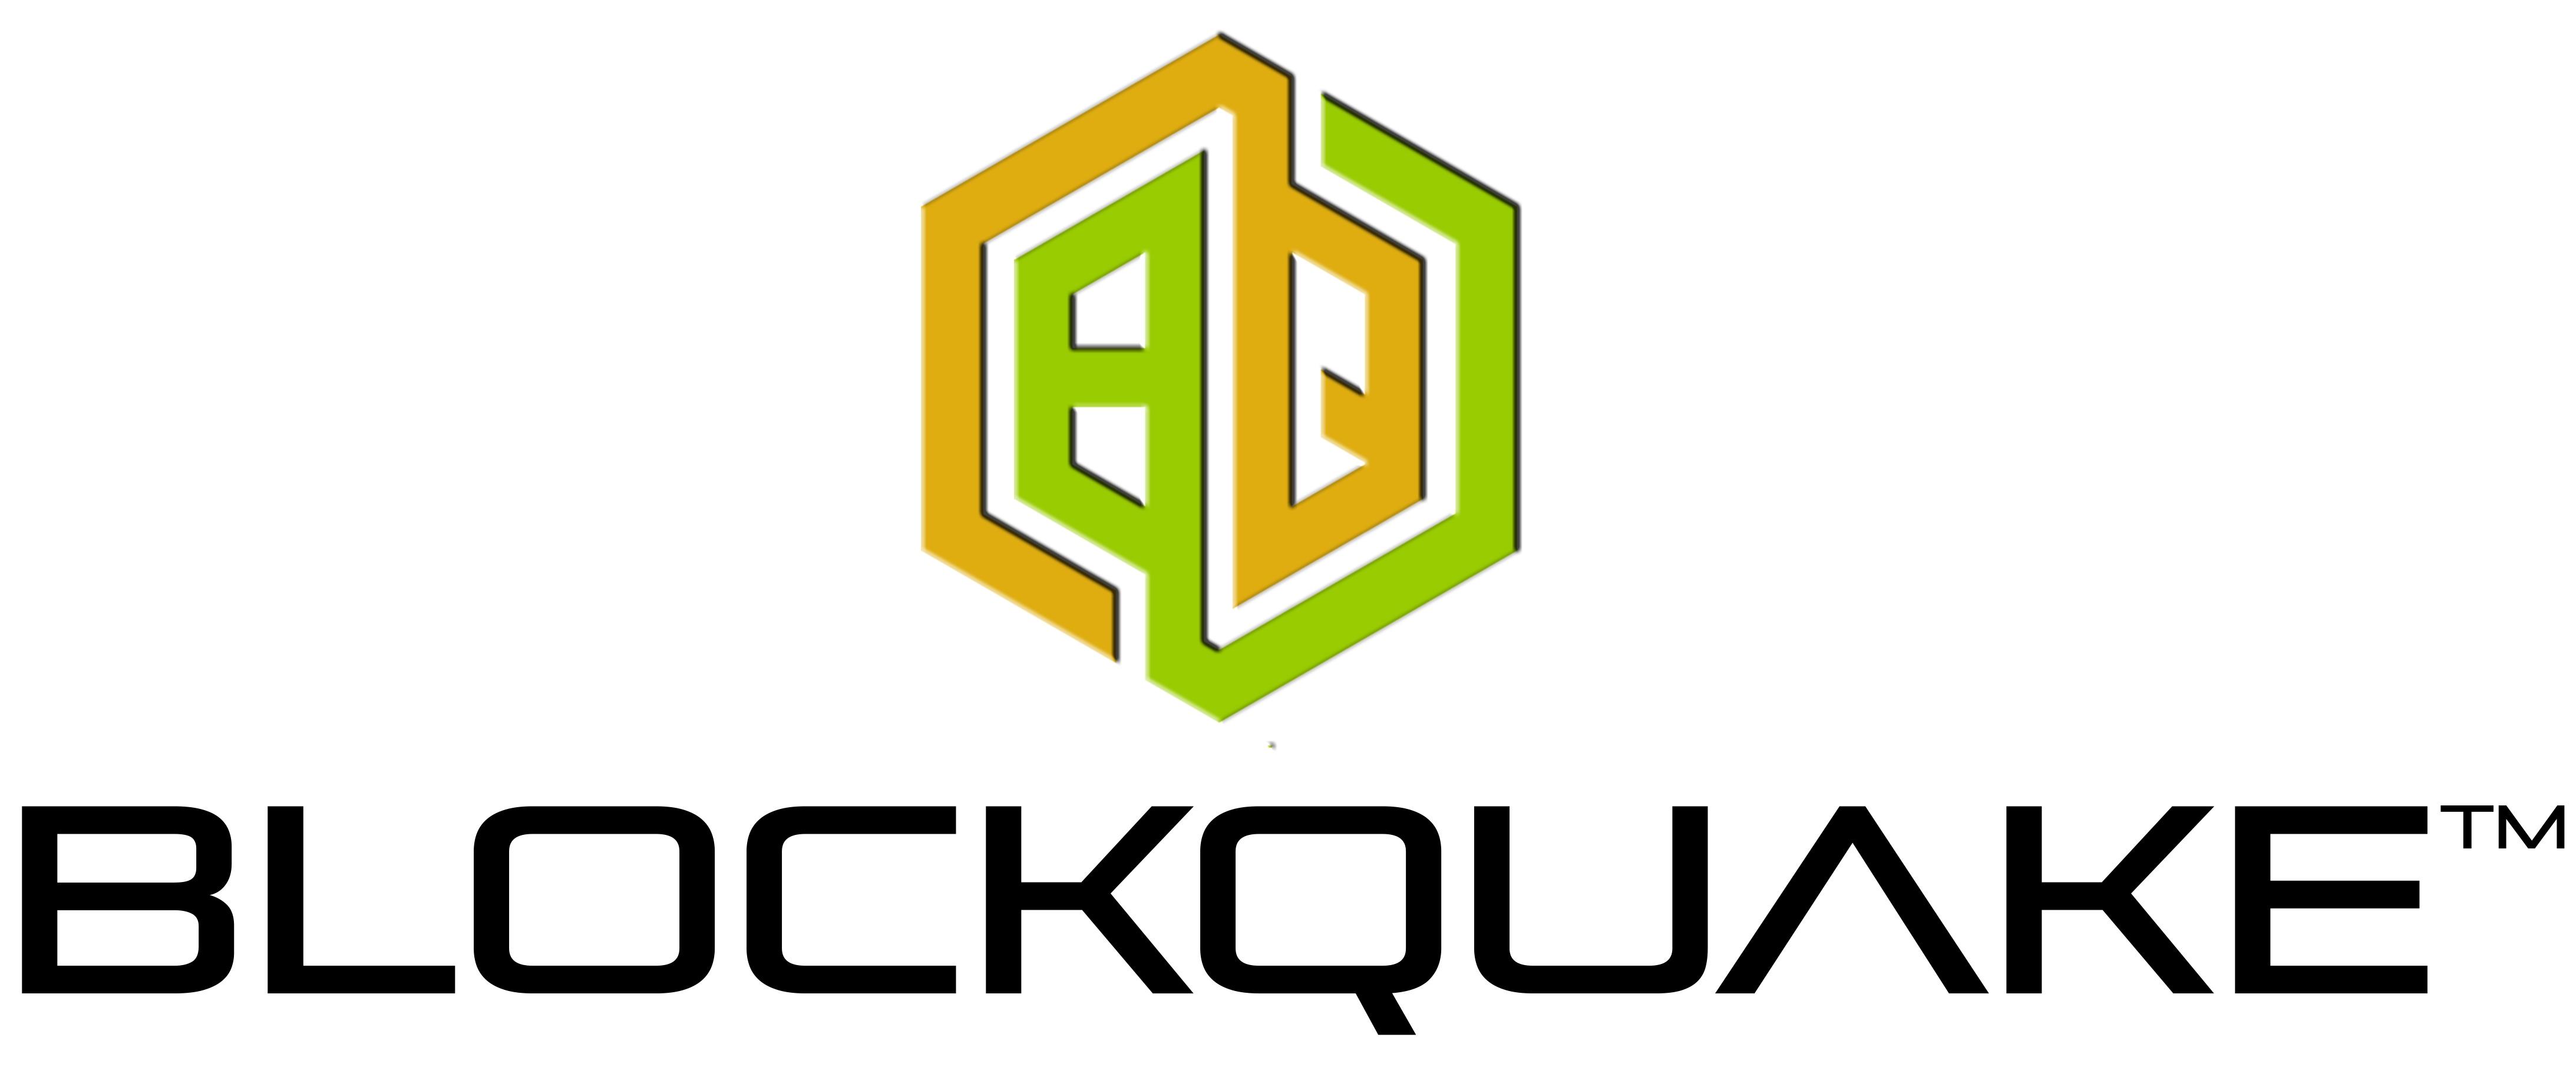 BlockQuake